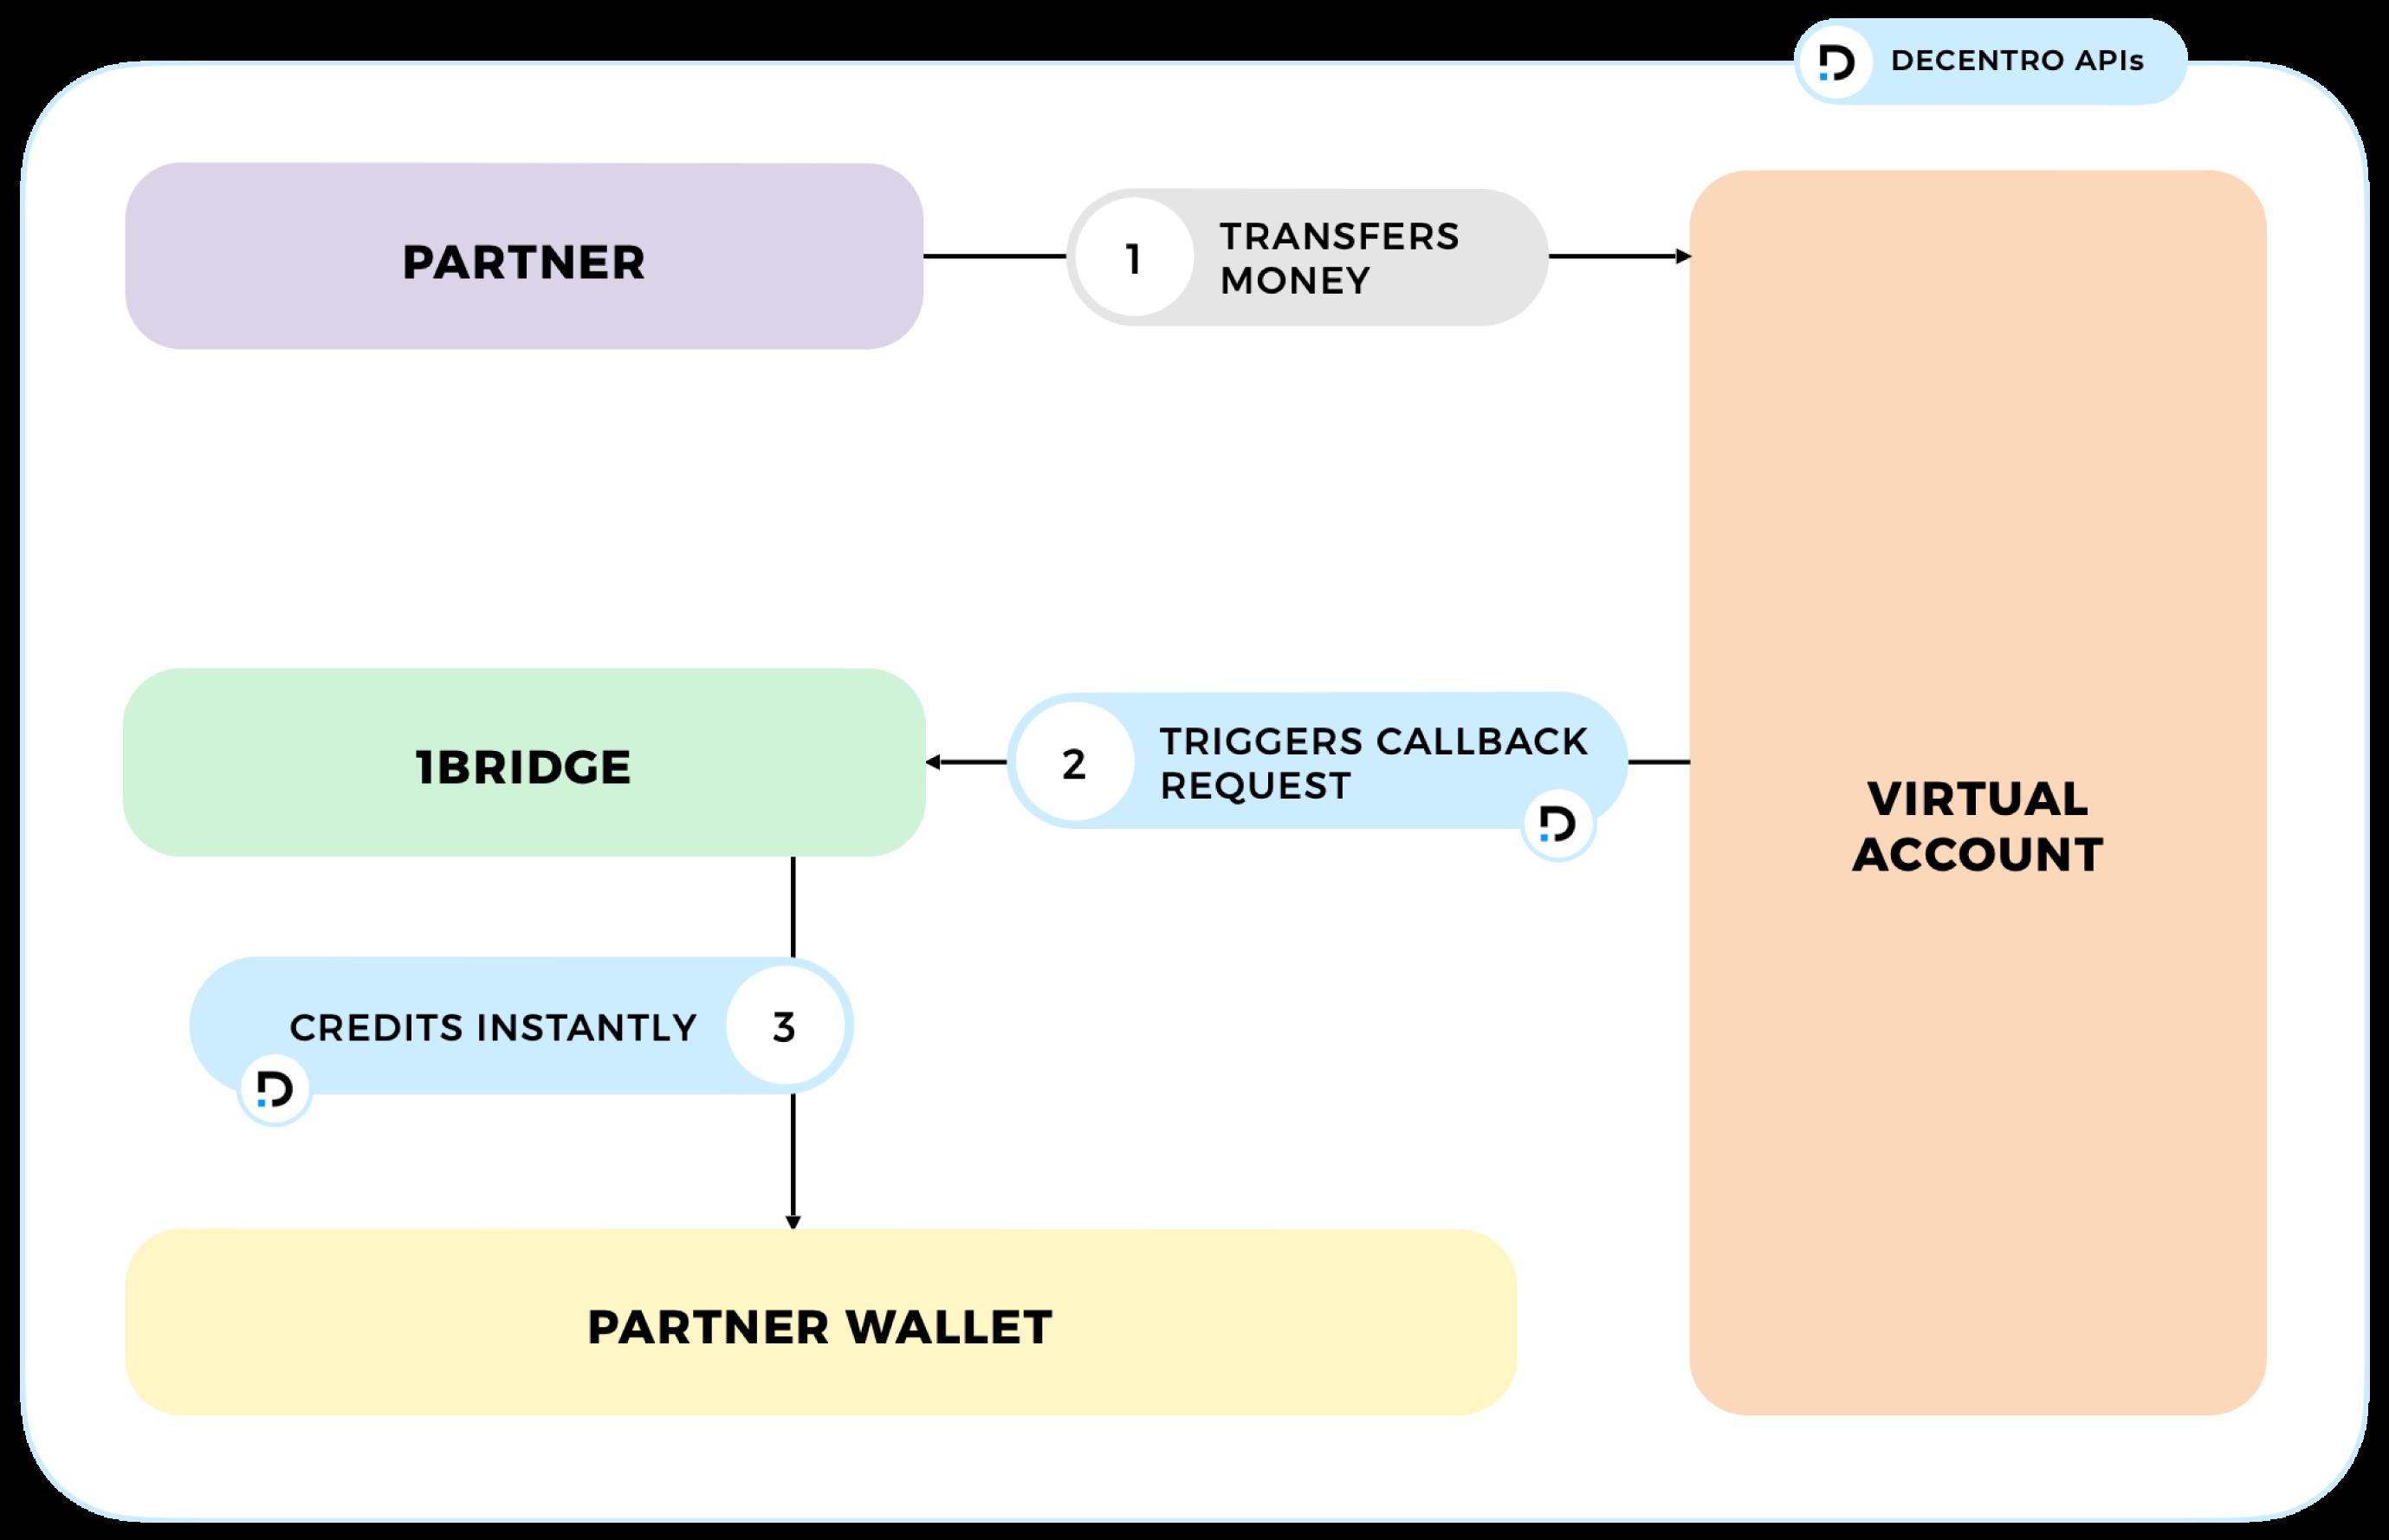 Workflow diagram describing how Decentro resolved collections & reconciliation challenges for 1Bridge